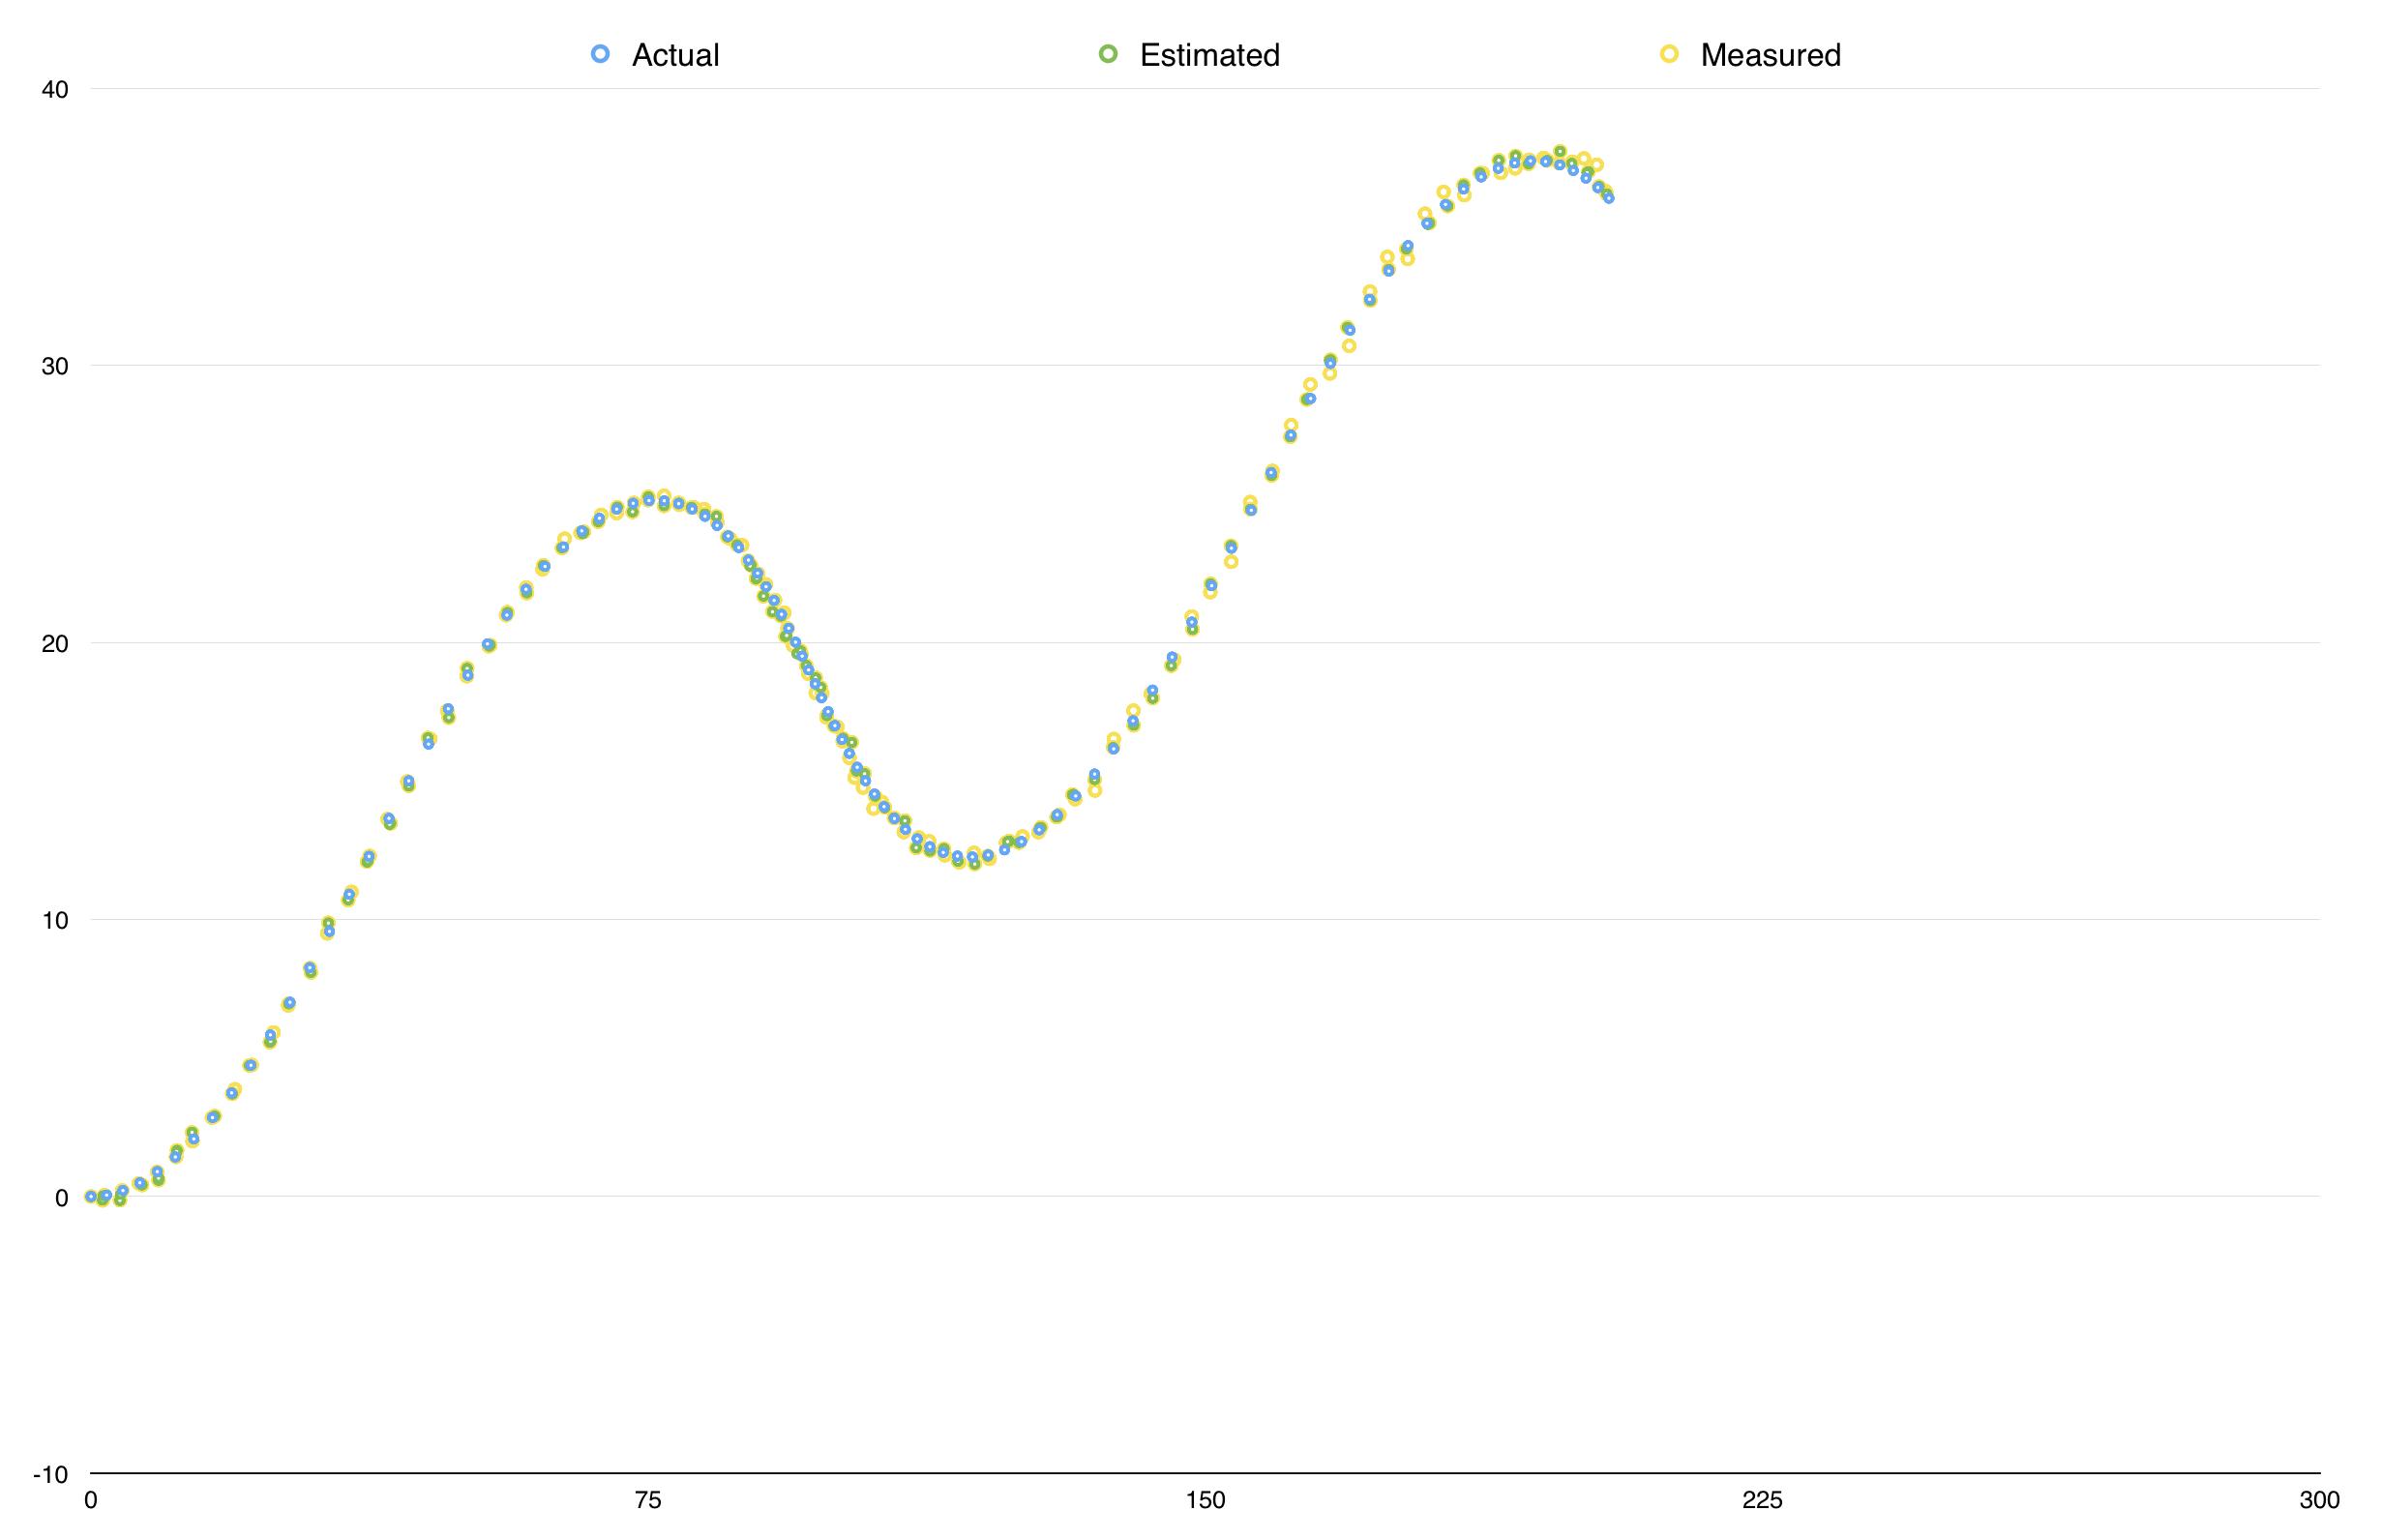 dataset 2 results